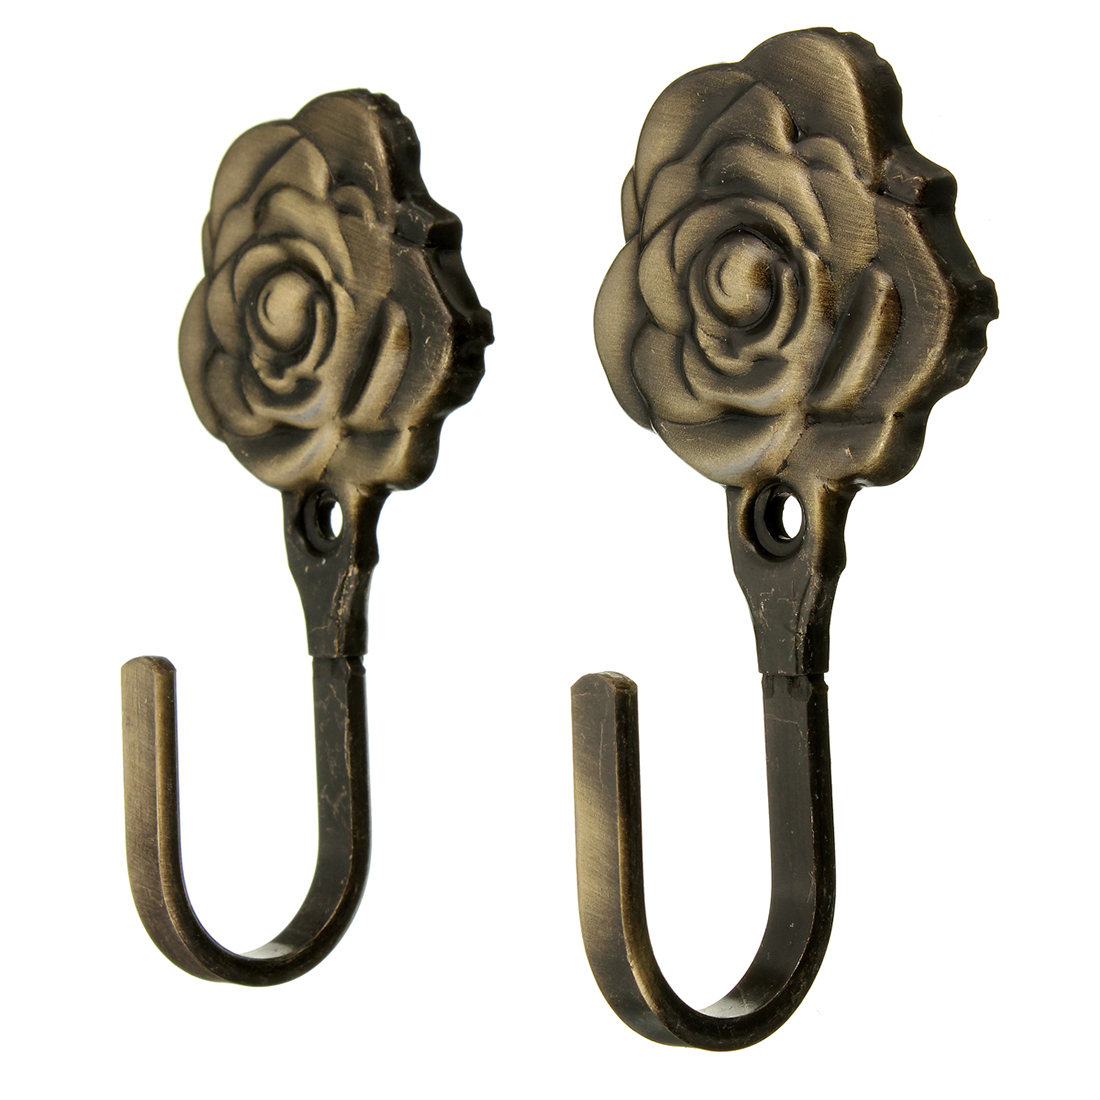 Hot Sale 2Pcs Metal Rose Flower Curtain Tie Back Tieback Holders Wall Hooks Decor